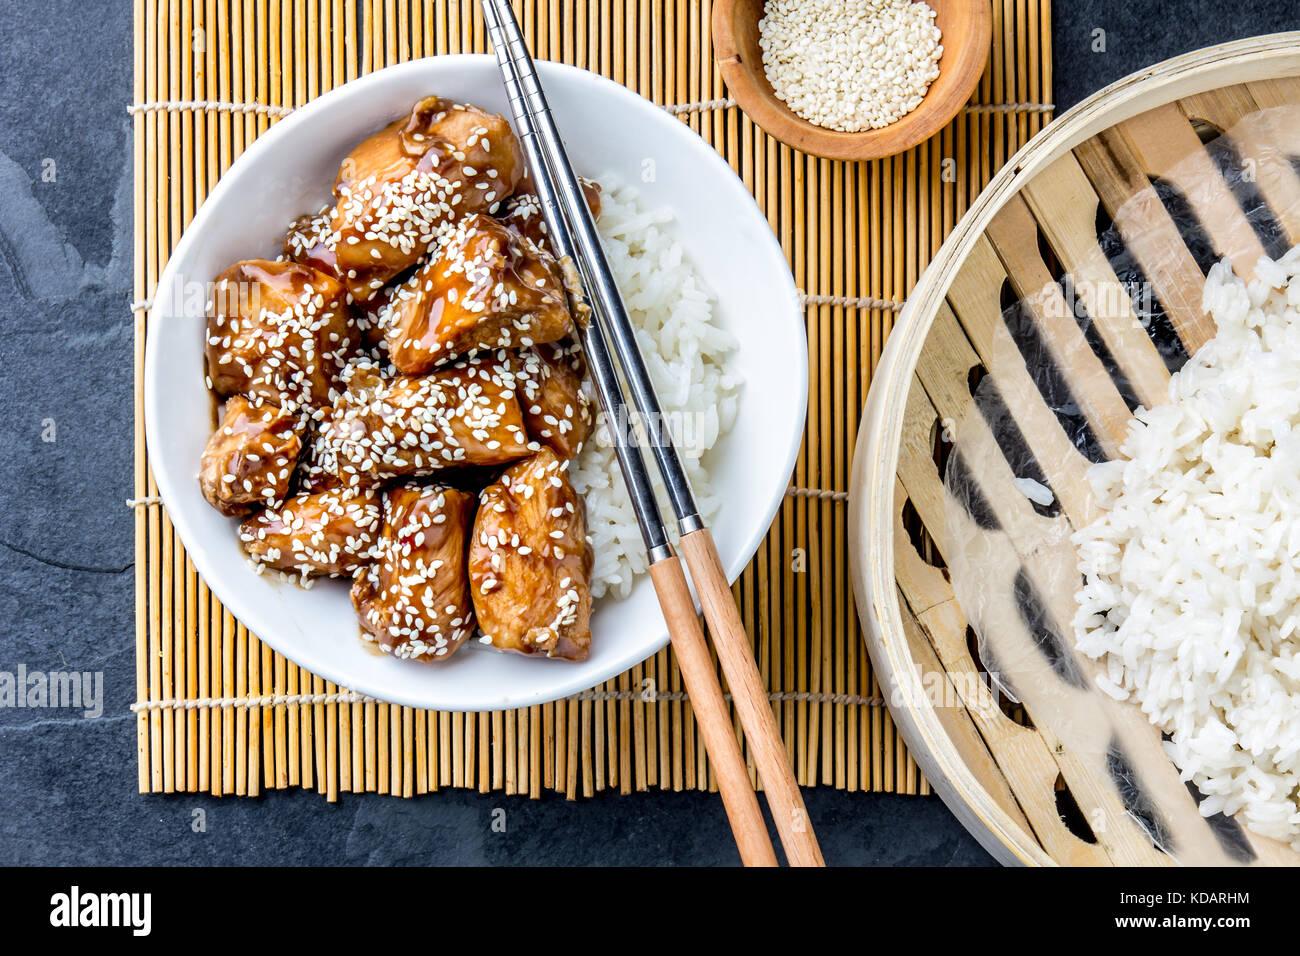 Japanese food chicken teriyaki with rice slate background top japanese food chicken teriyaki with rice slate background top view forumfinder Gallery